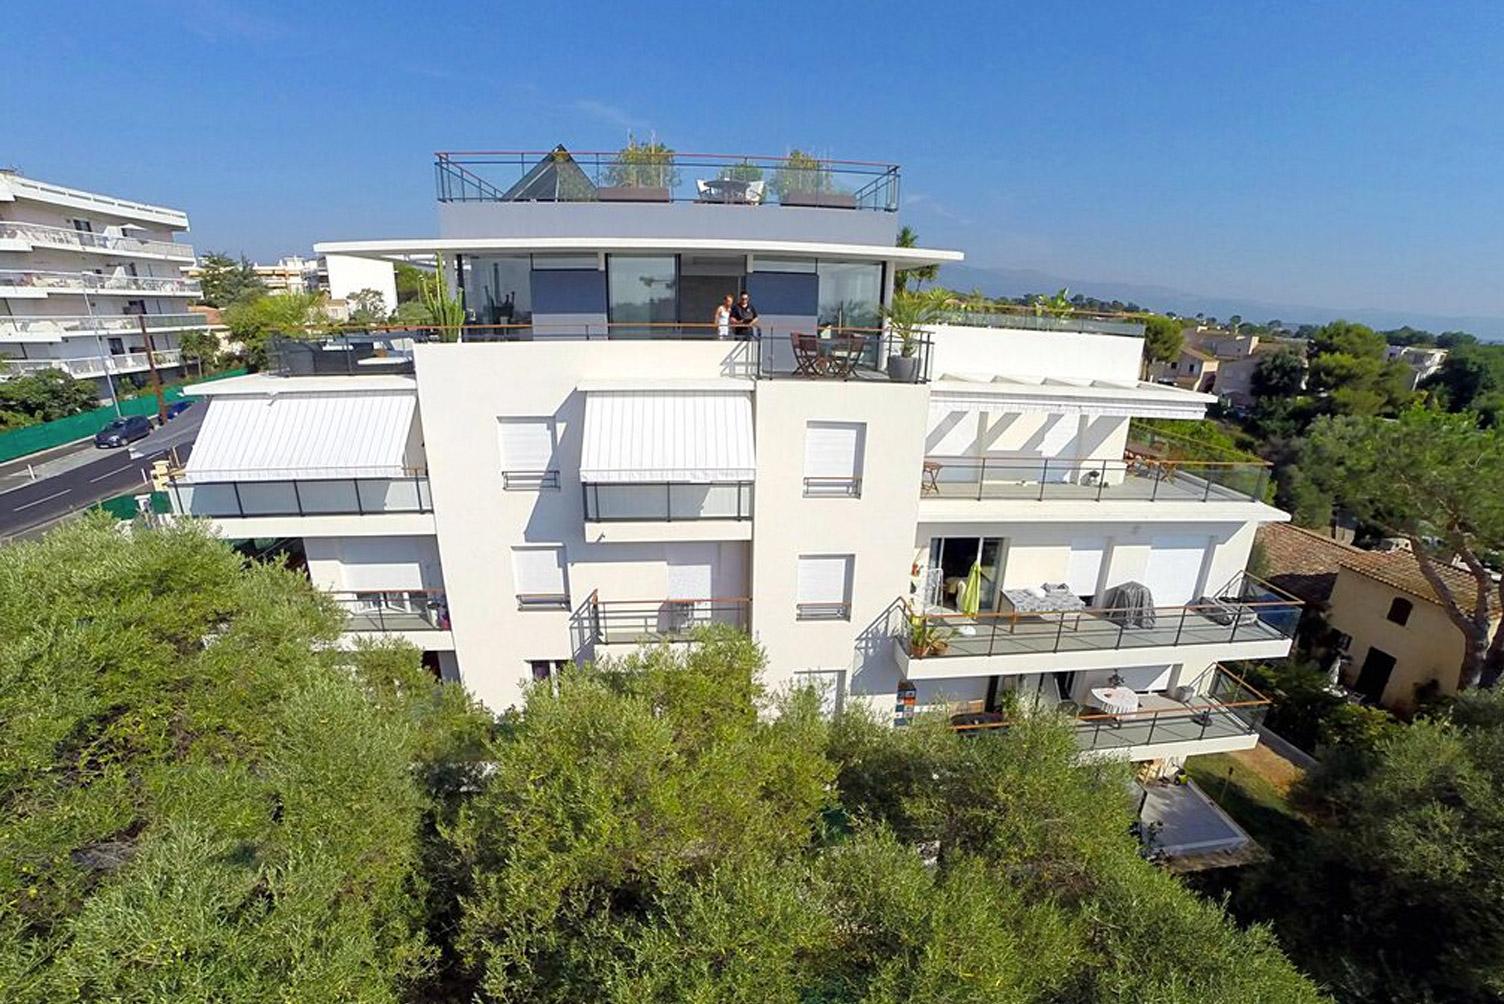 Appartements à Vendre Oressence Antibes